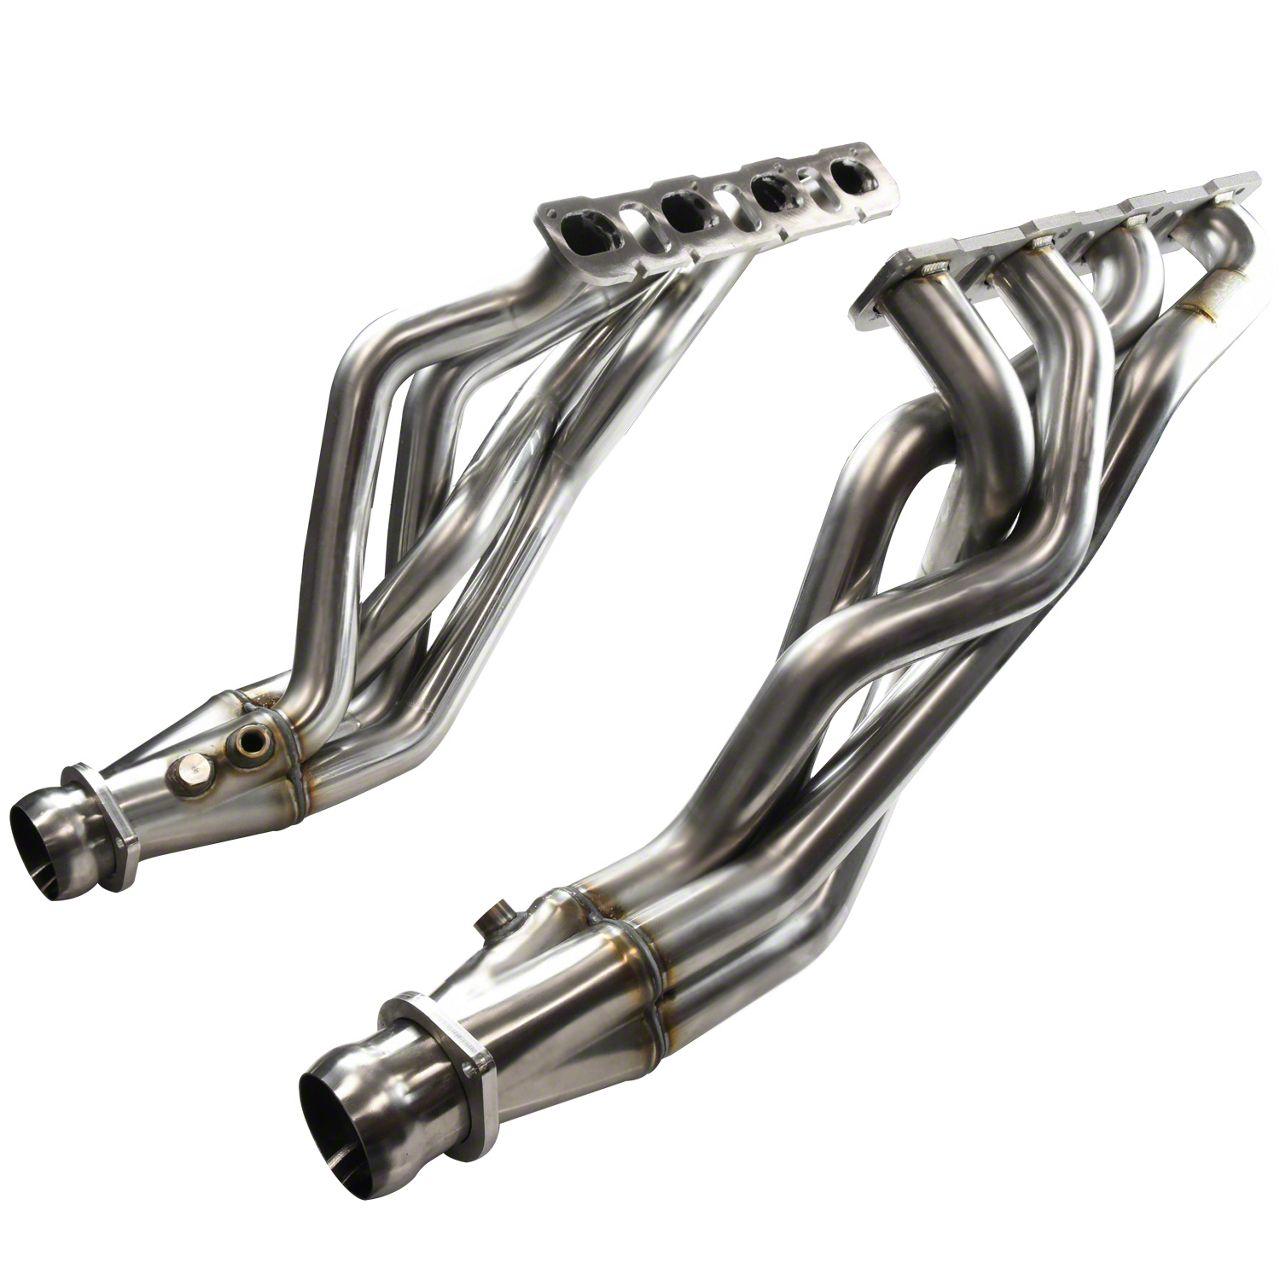 Kooks 2 in. Long Tube Headers (08-18 5.7L HEMI, 6.1L HEMI, 6.4L HEMI)